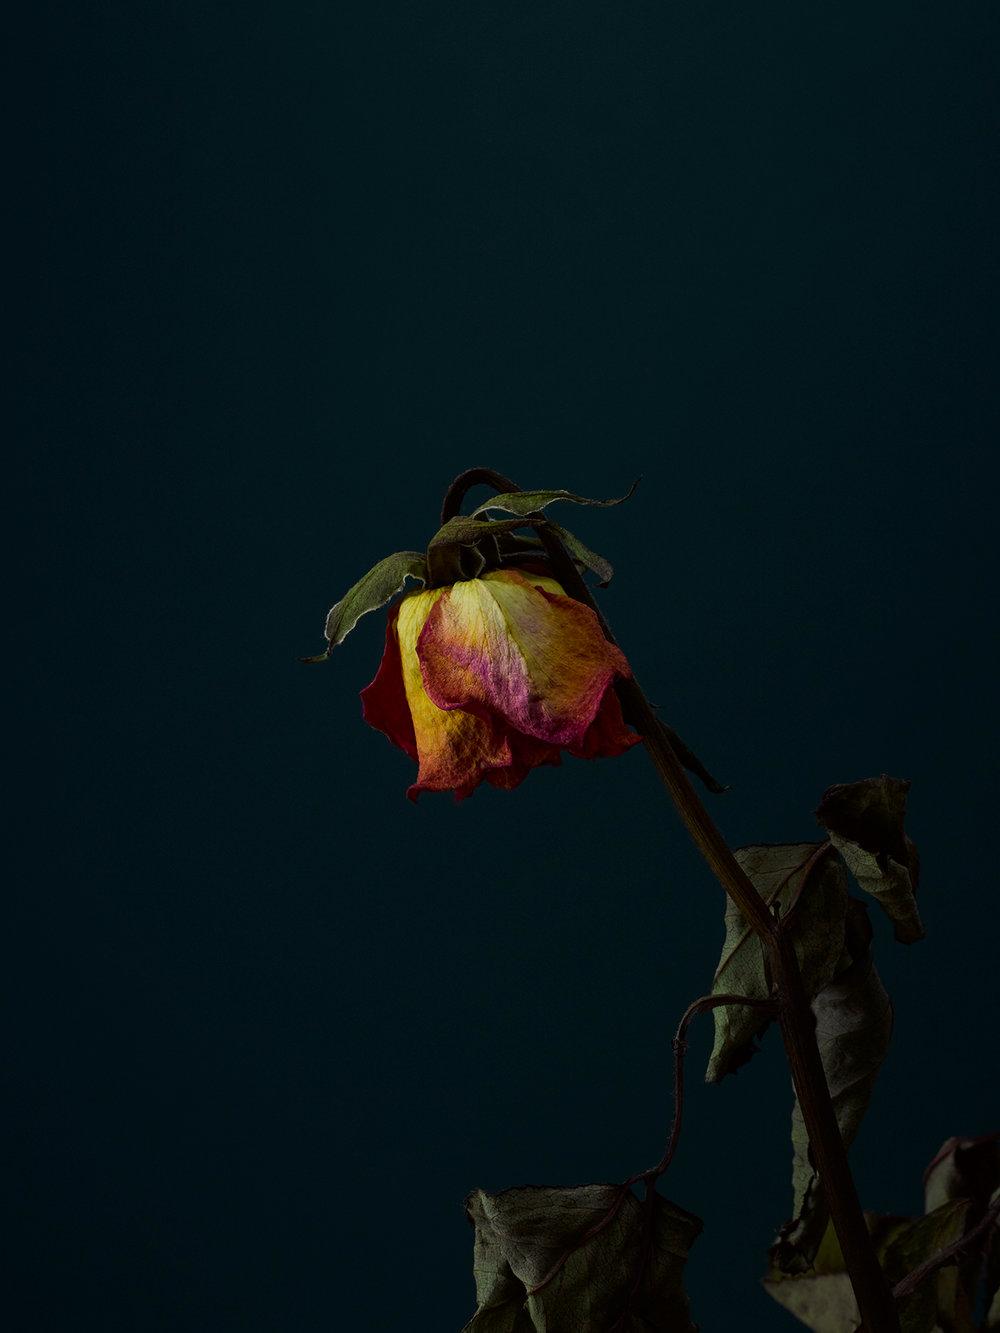 rose-4-copy.jpg